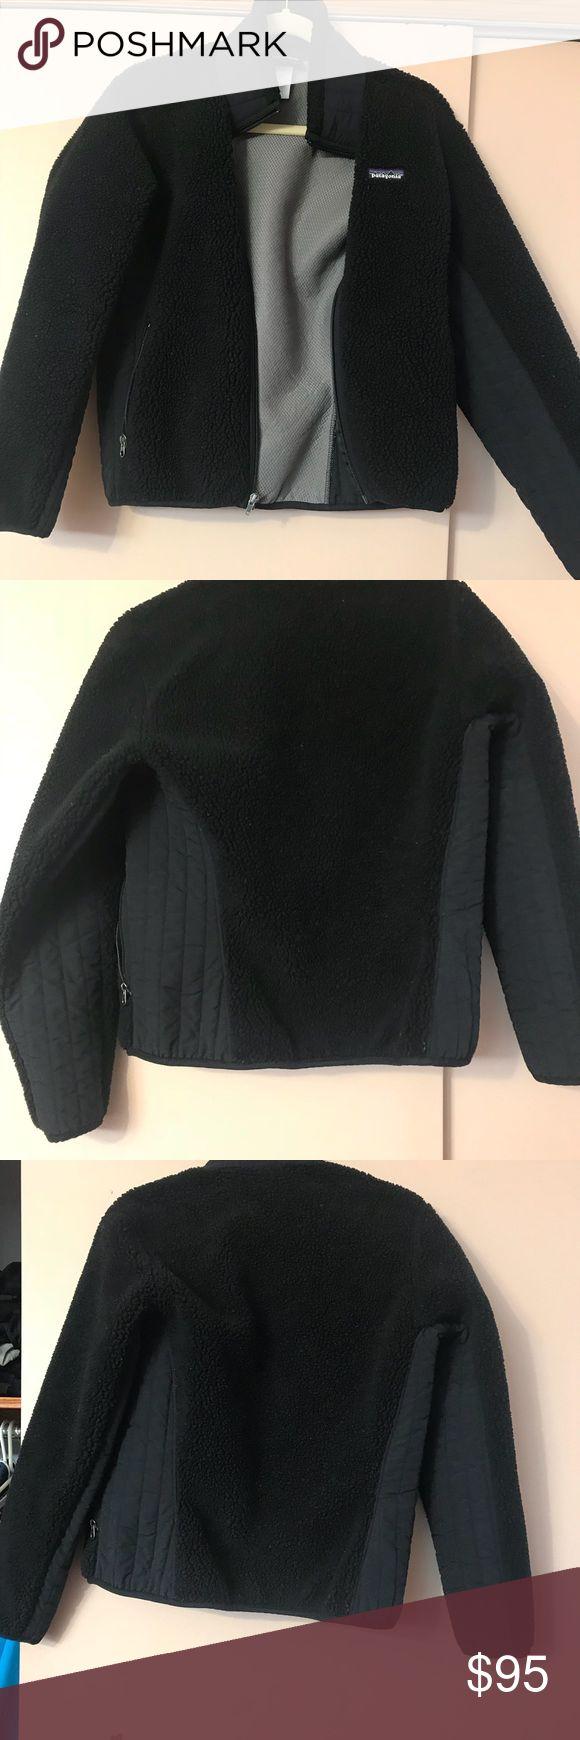 Patagonia Synchilla Fleece Very good condition Patagonia Jackets & Coats Blazers